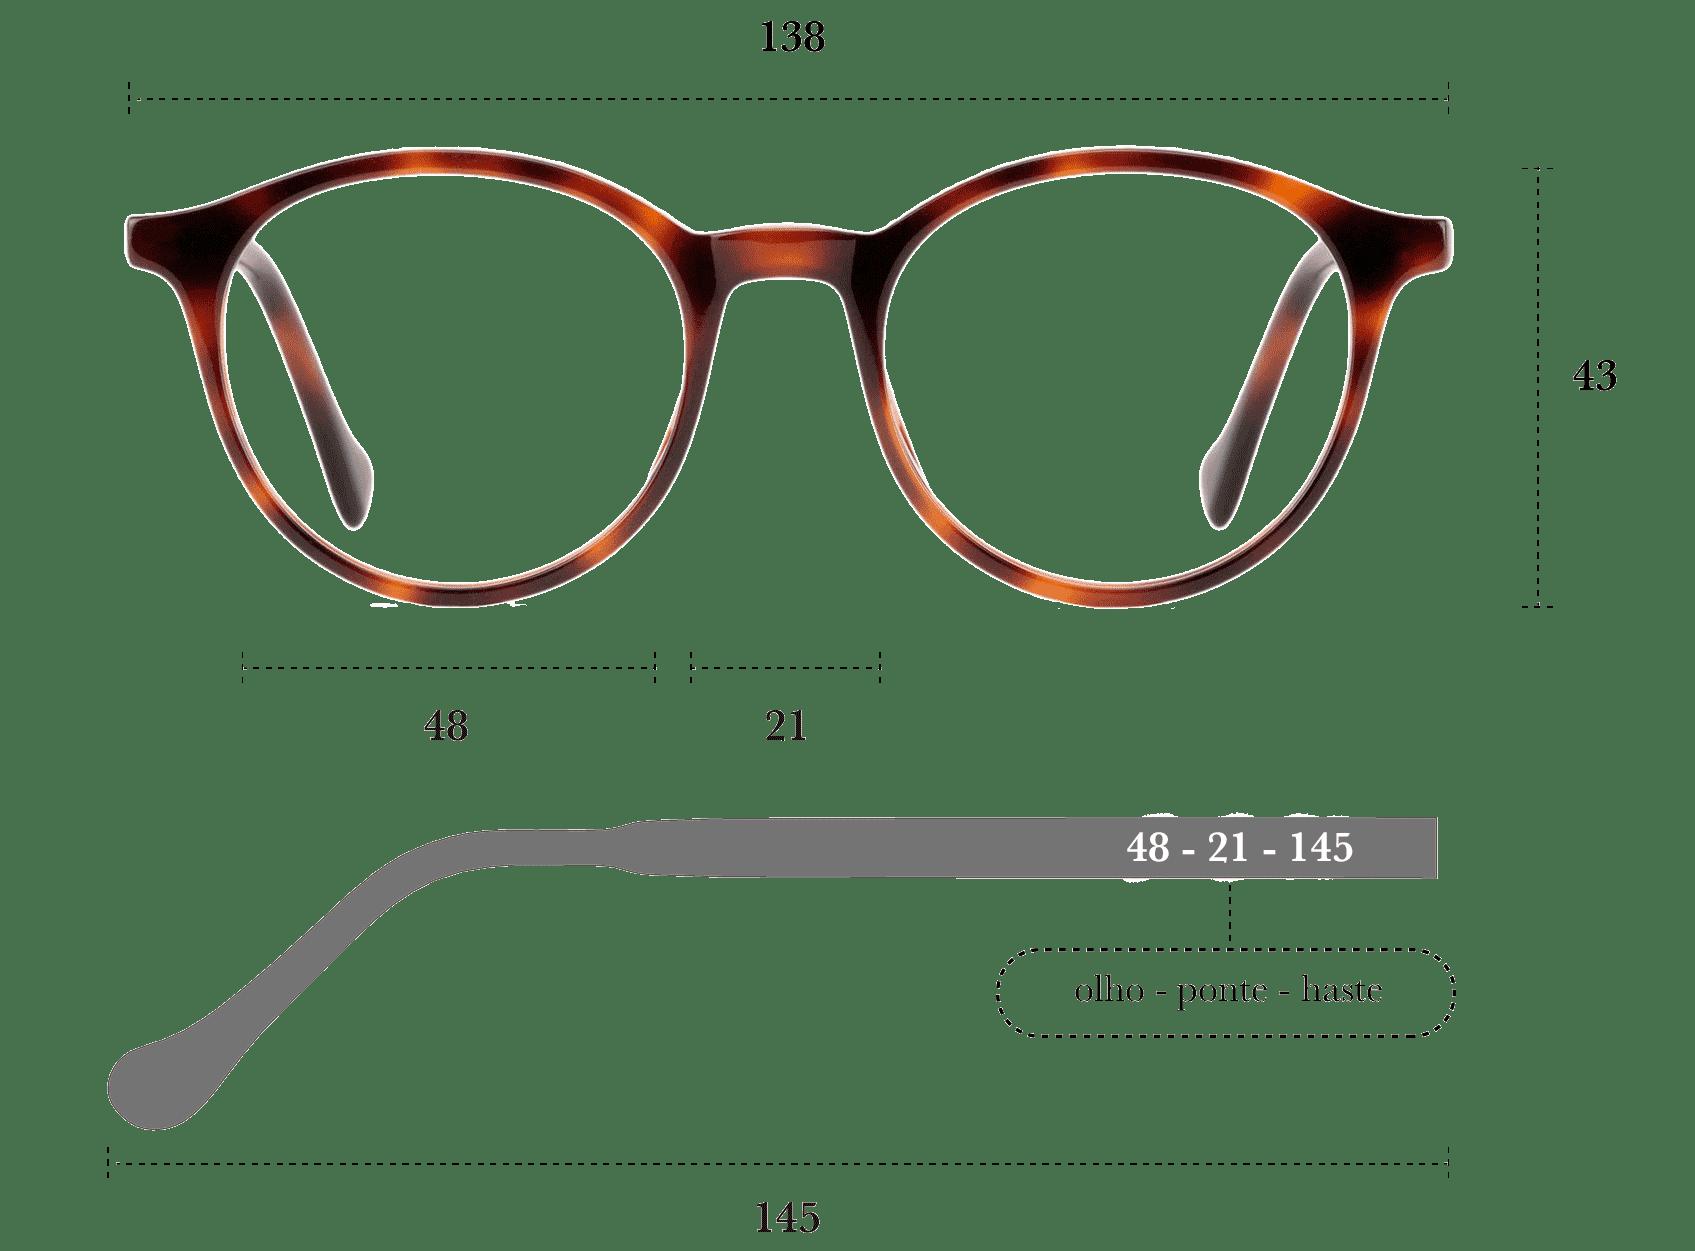 Desenho técnico do óculos Olly